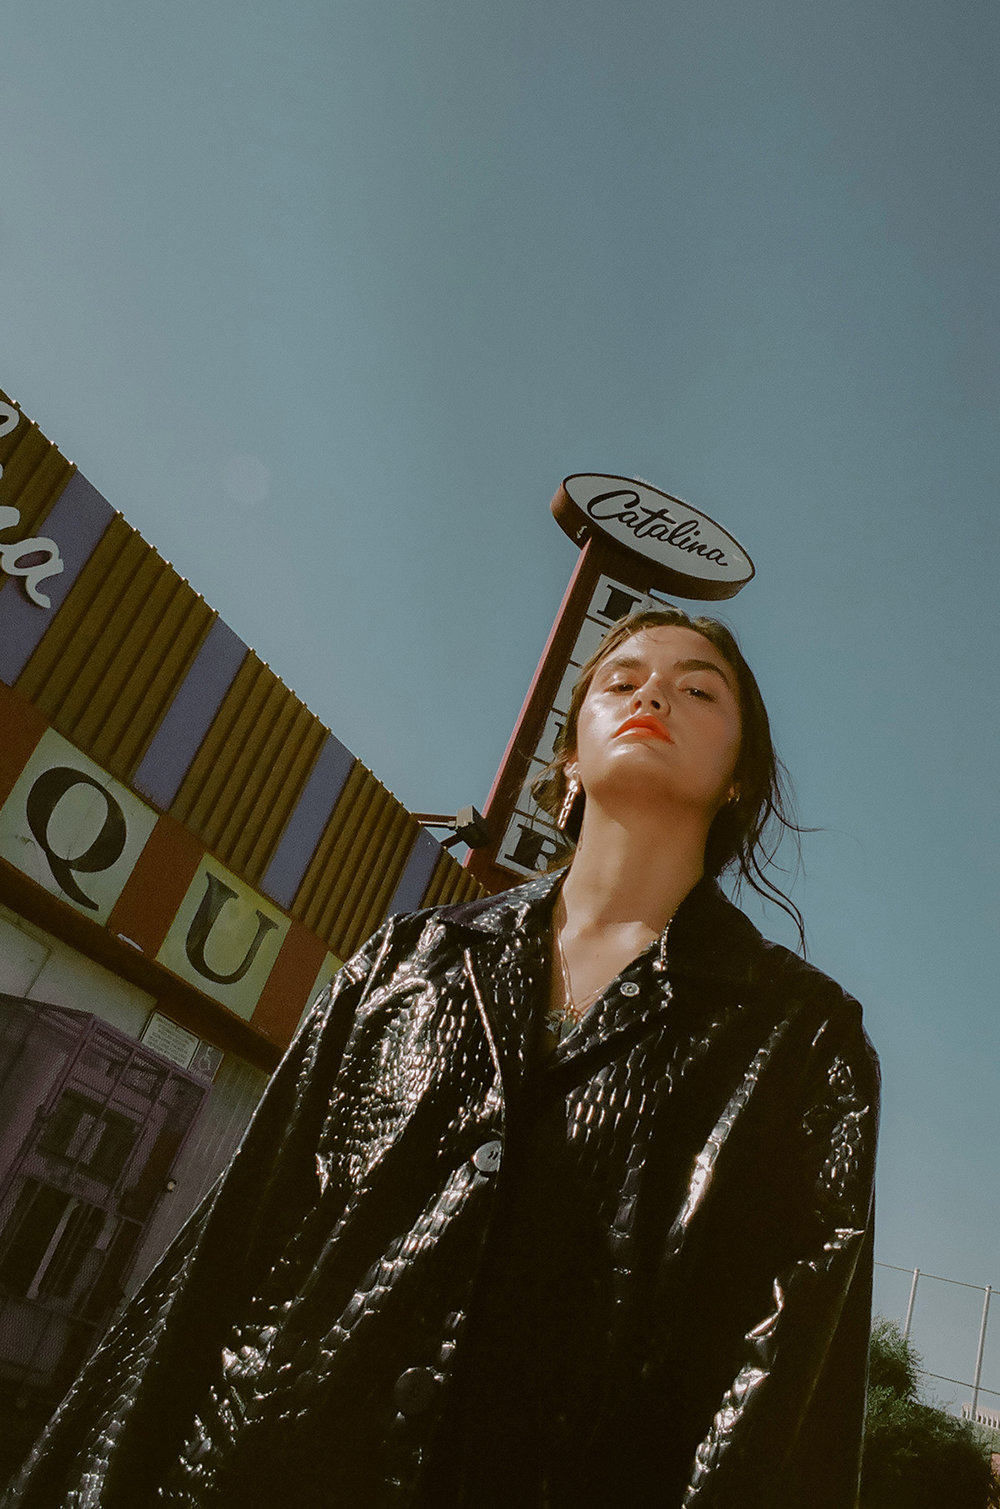 Photography by   Jess Brohier   Style by   Shelbie Lloyd     MUA   Danielley A     Talent     Cheyenne